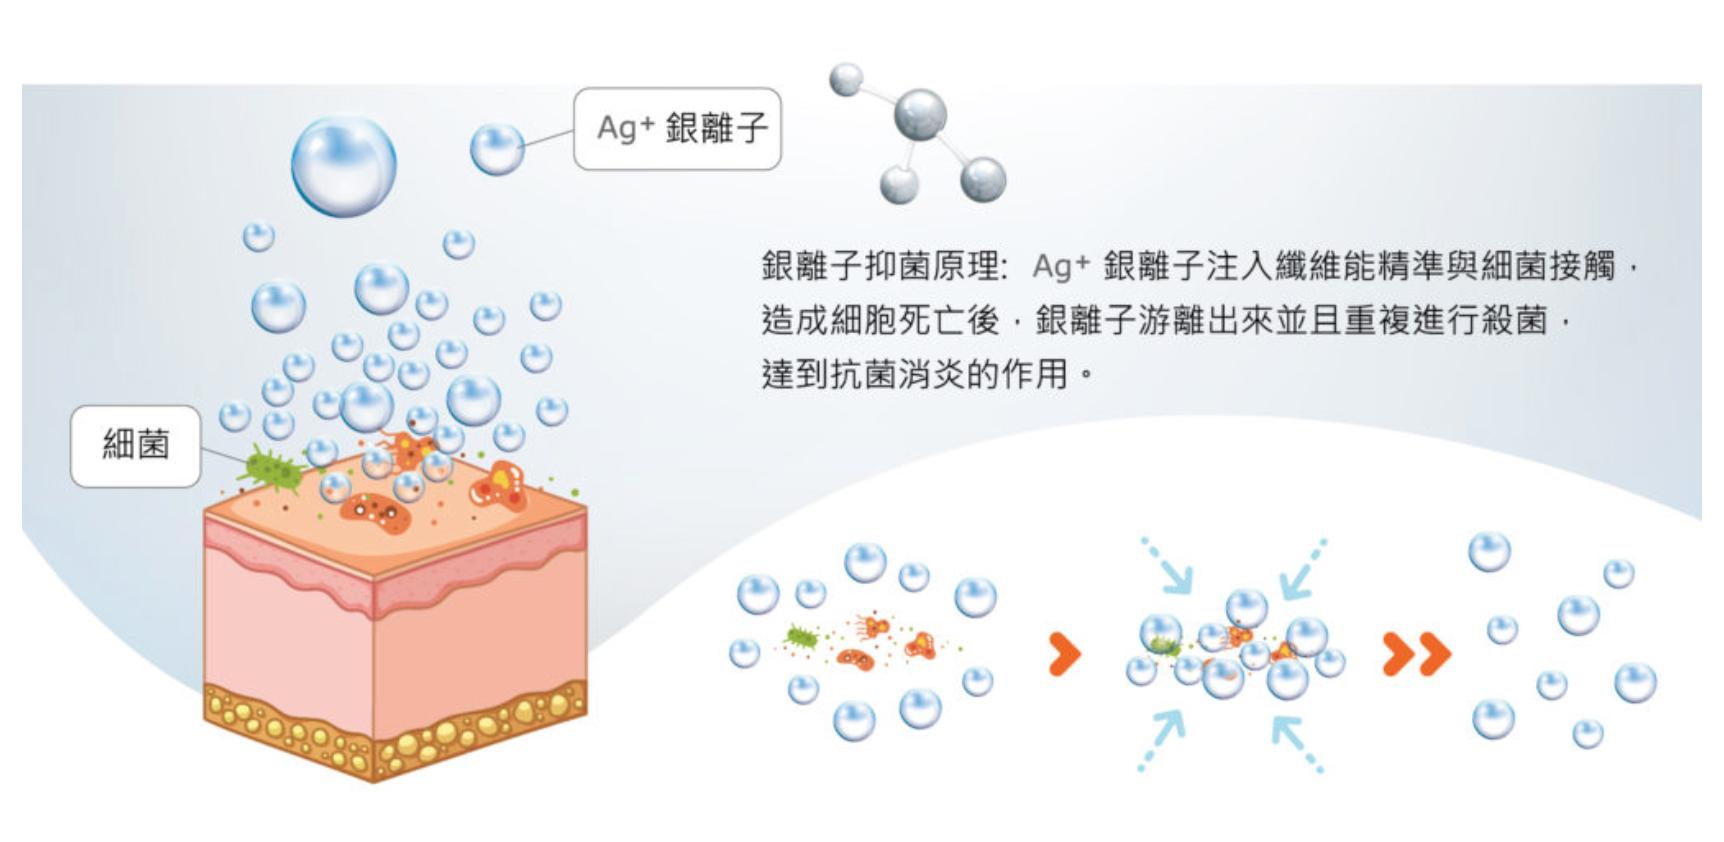 Ag+銀離子真的能抗菌嗎?